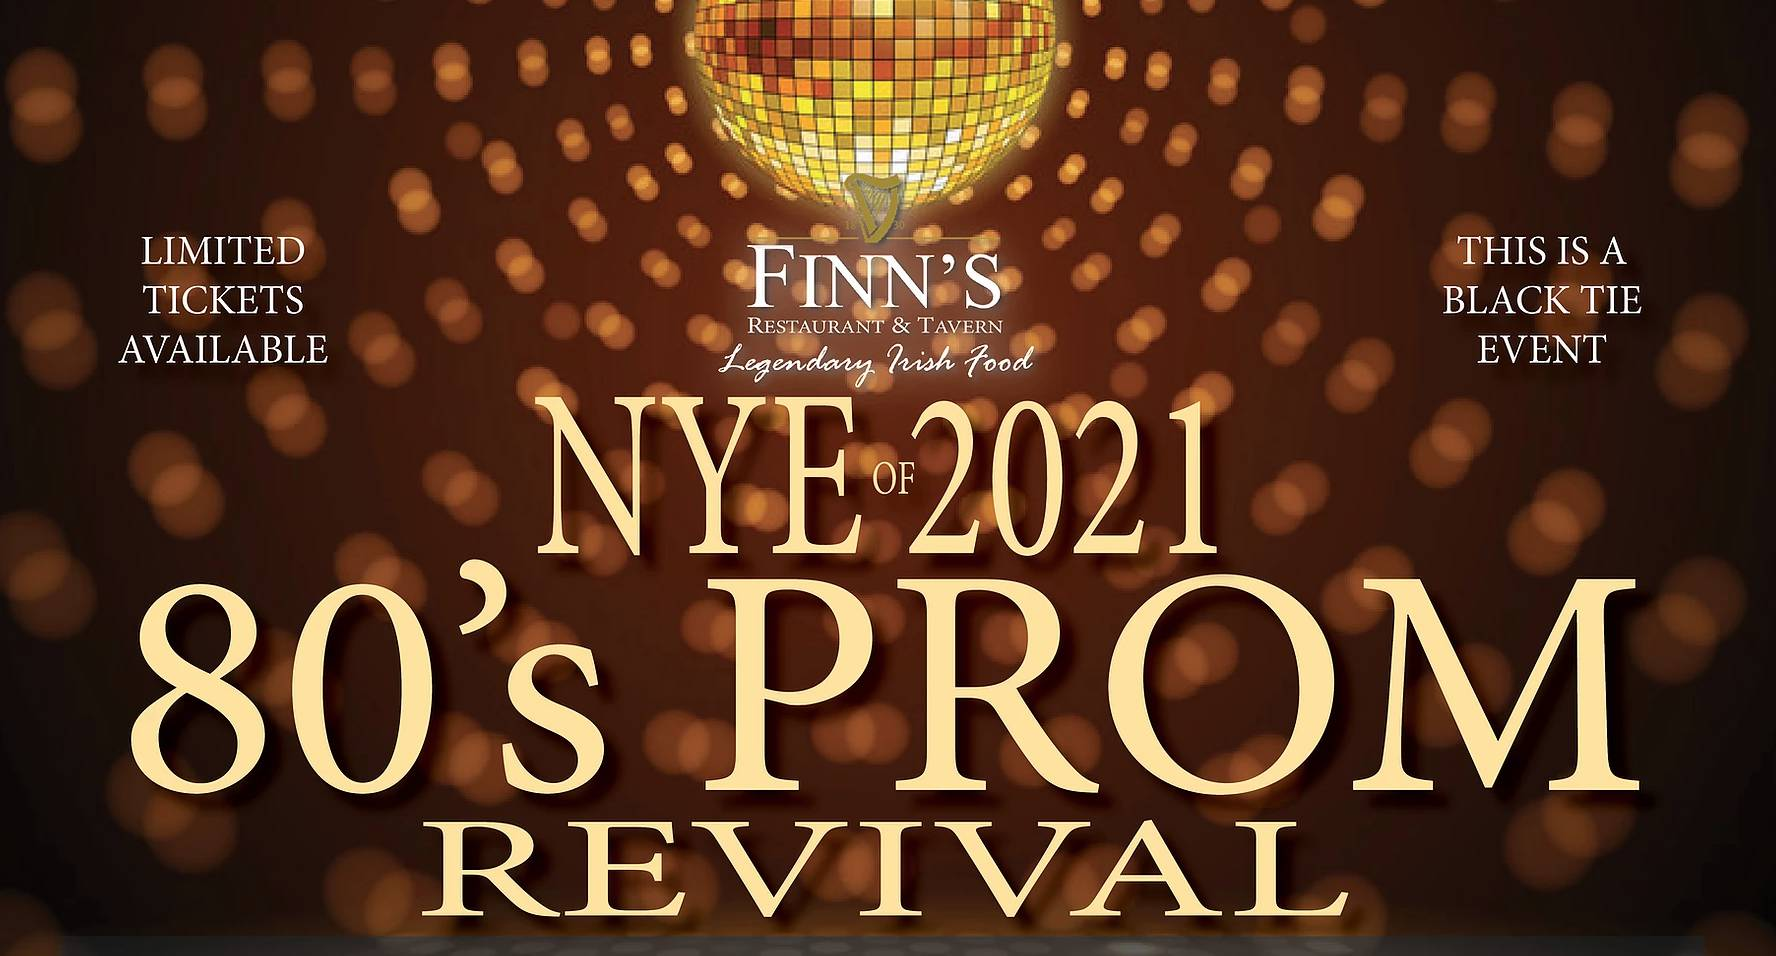 NYE 80s Prom Revival